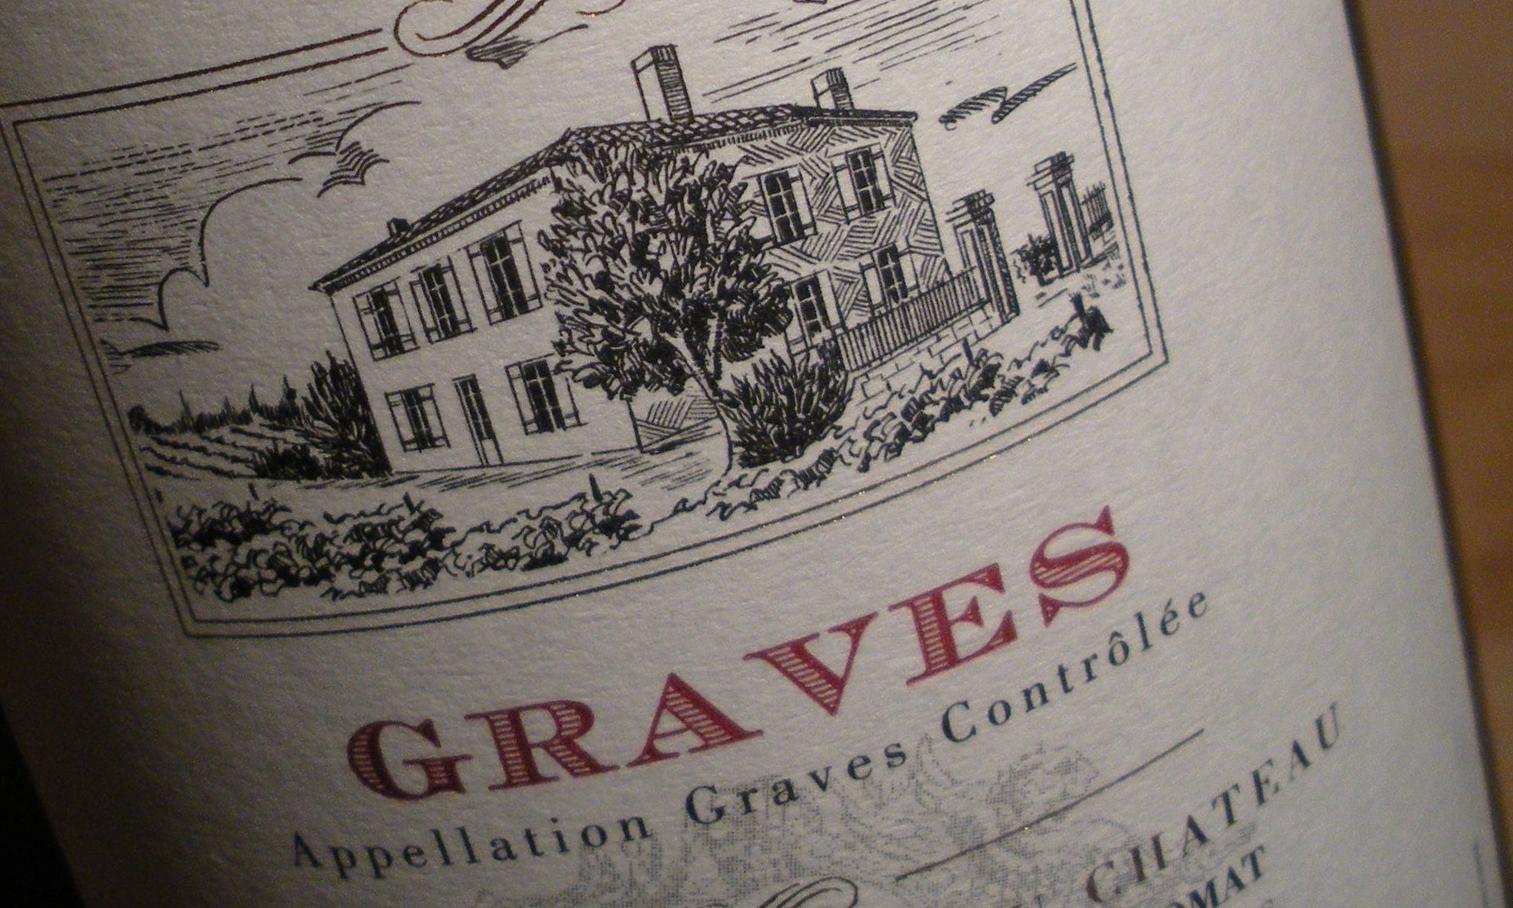 Bordeaux 2010: Spurrier lavishes praise on the Graves